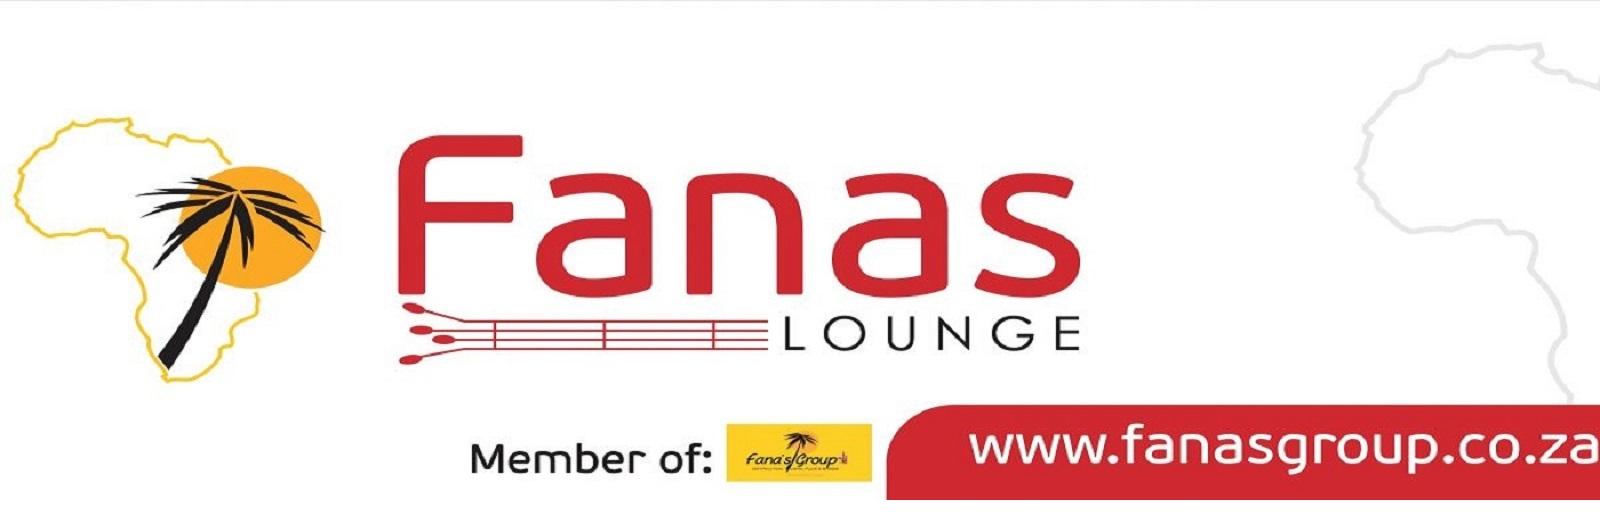 Lounge-1200x440